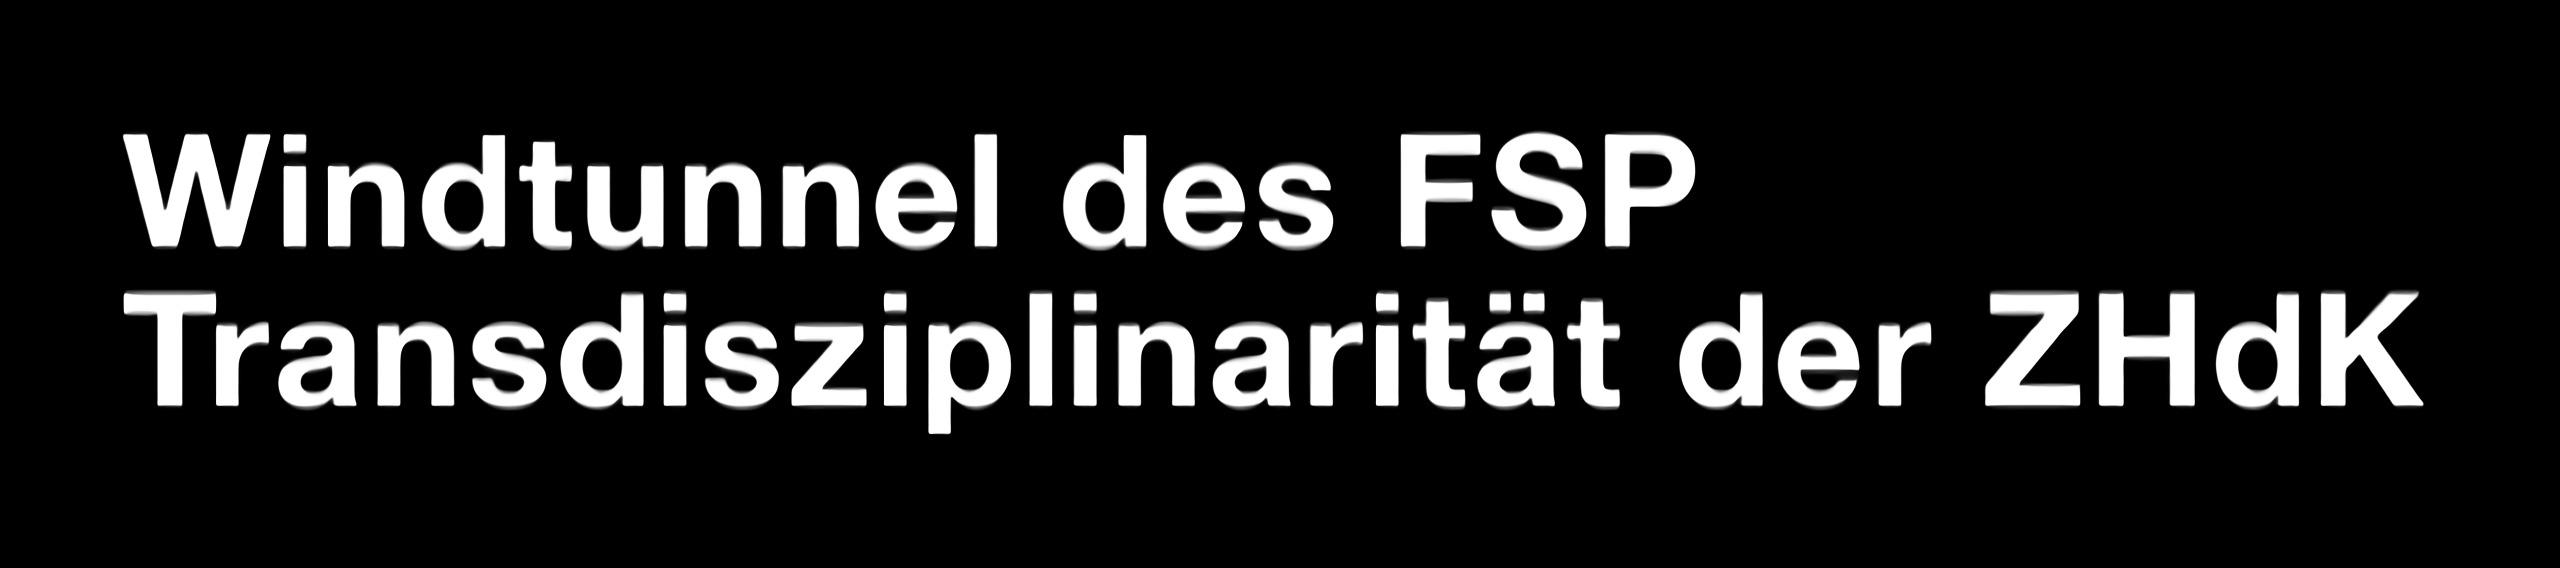 Windkanal des FSP Transdisziplinarität der ZHdK